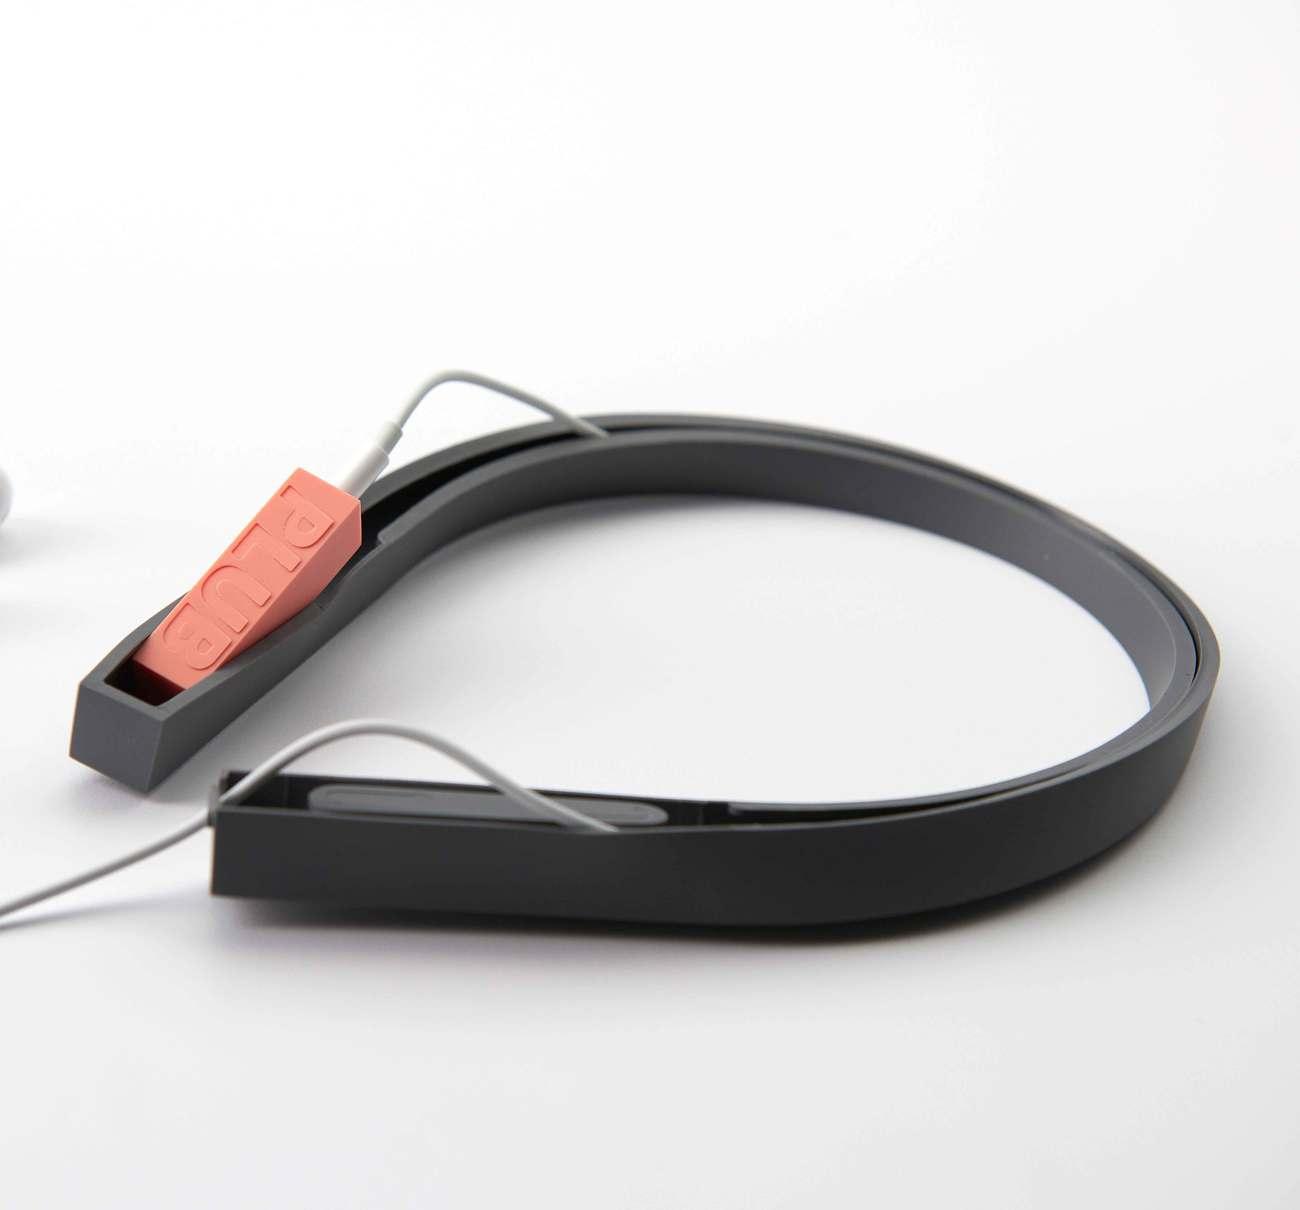 PLUB Minimalist Bluetooth Receiver